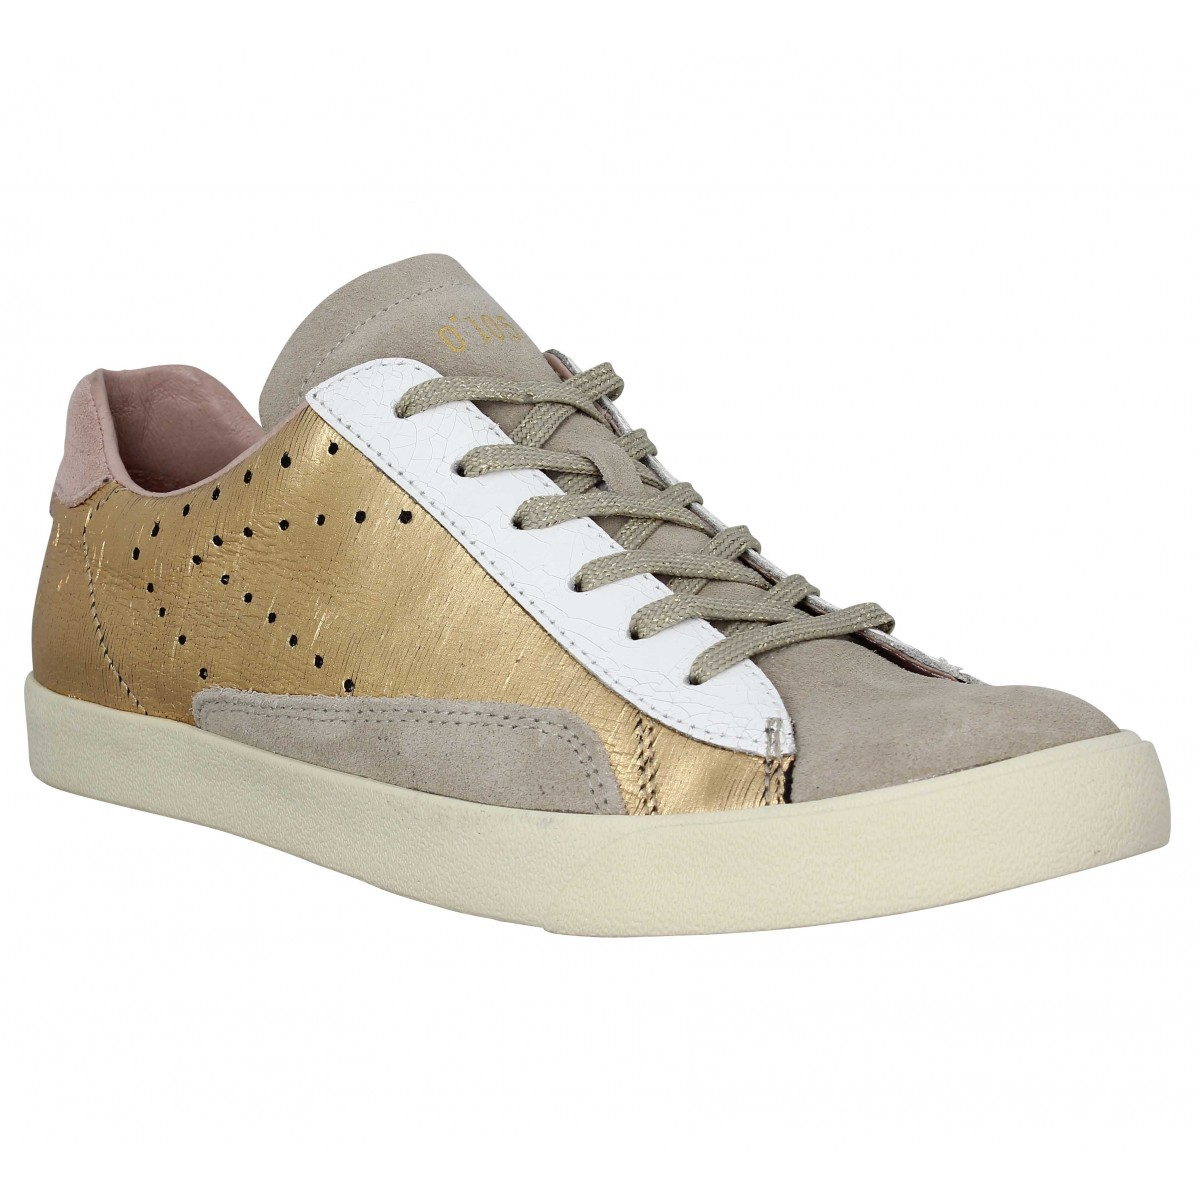 0 105 stan chris cuir femme gold femme   Fanny chaussures 022b132cce2b